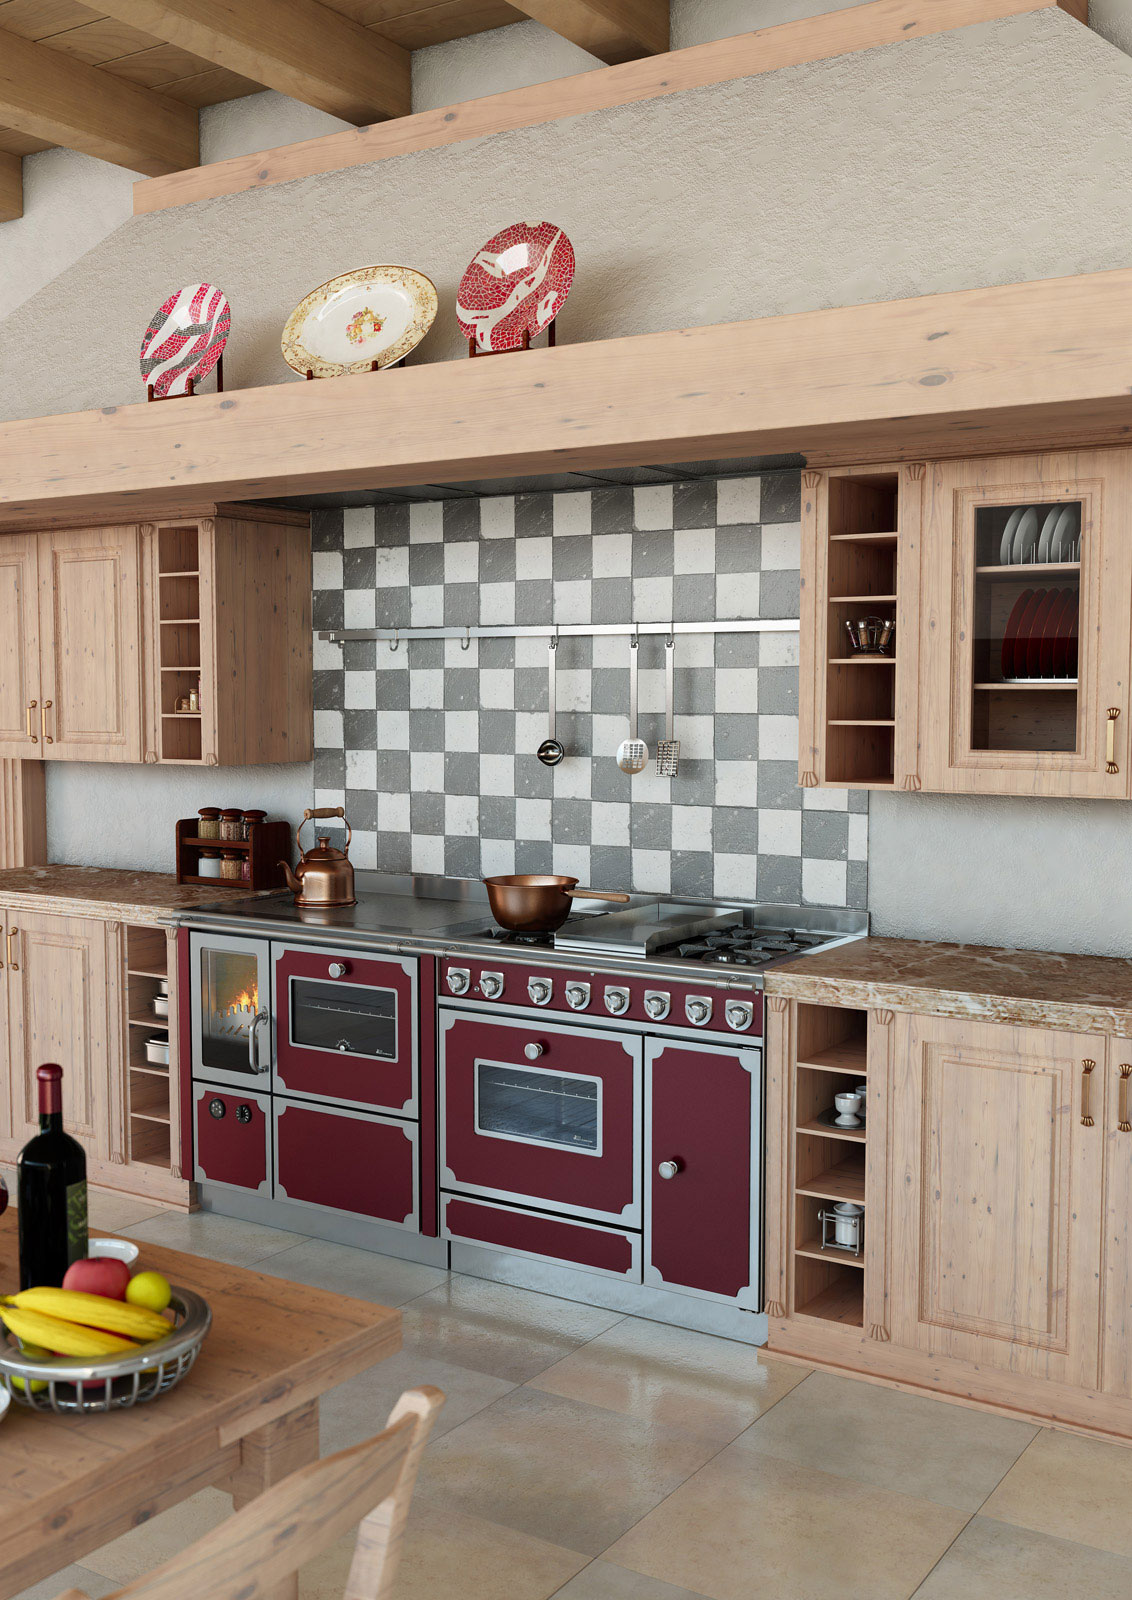 Fka900 demanincor s p a - Configura cucina ...